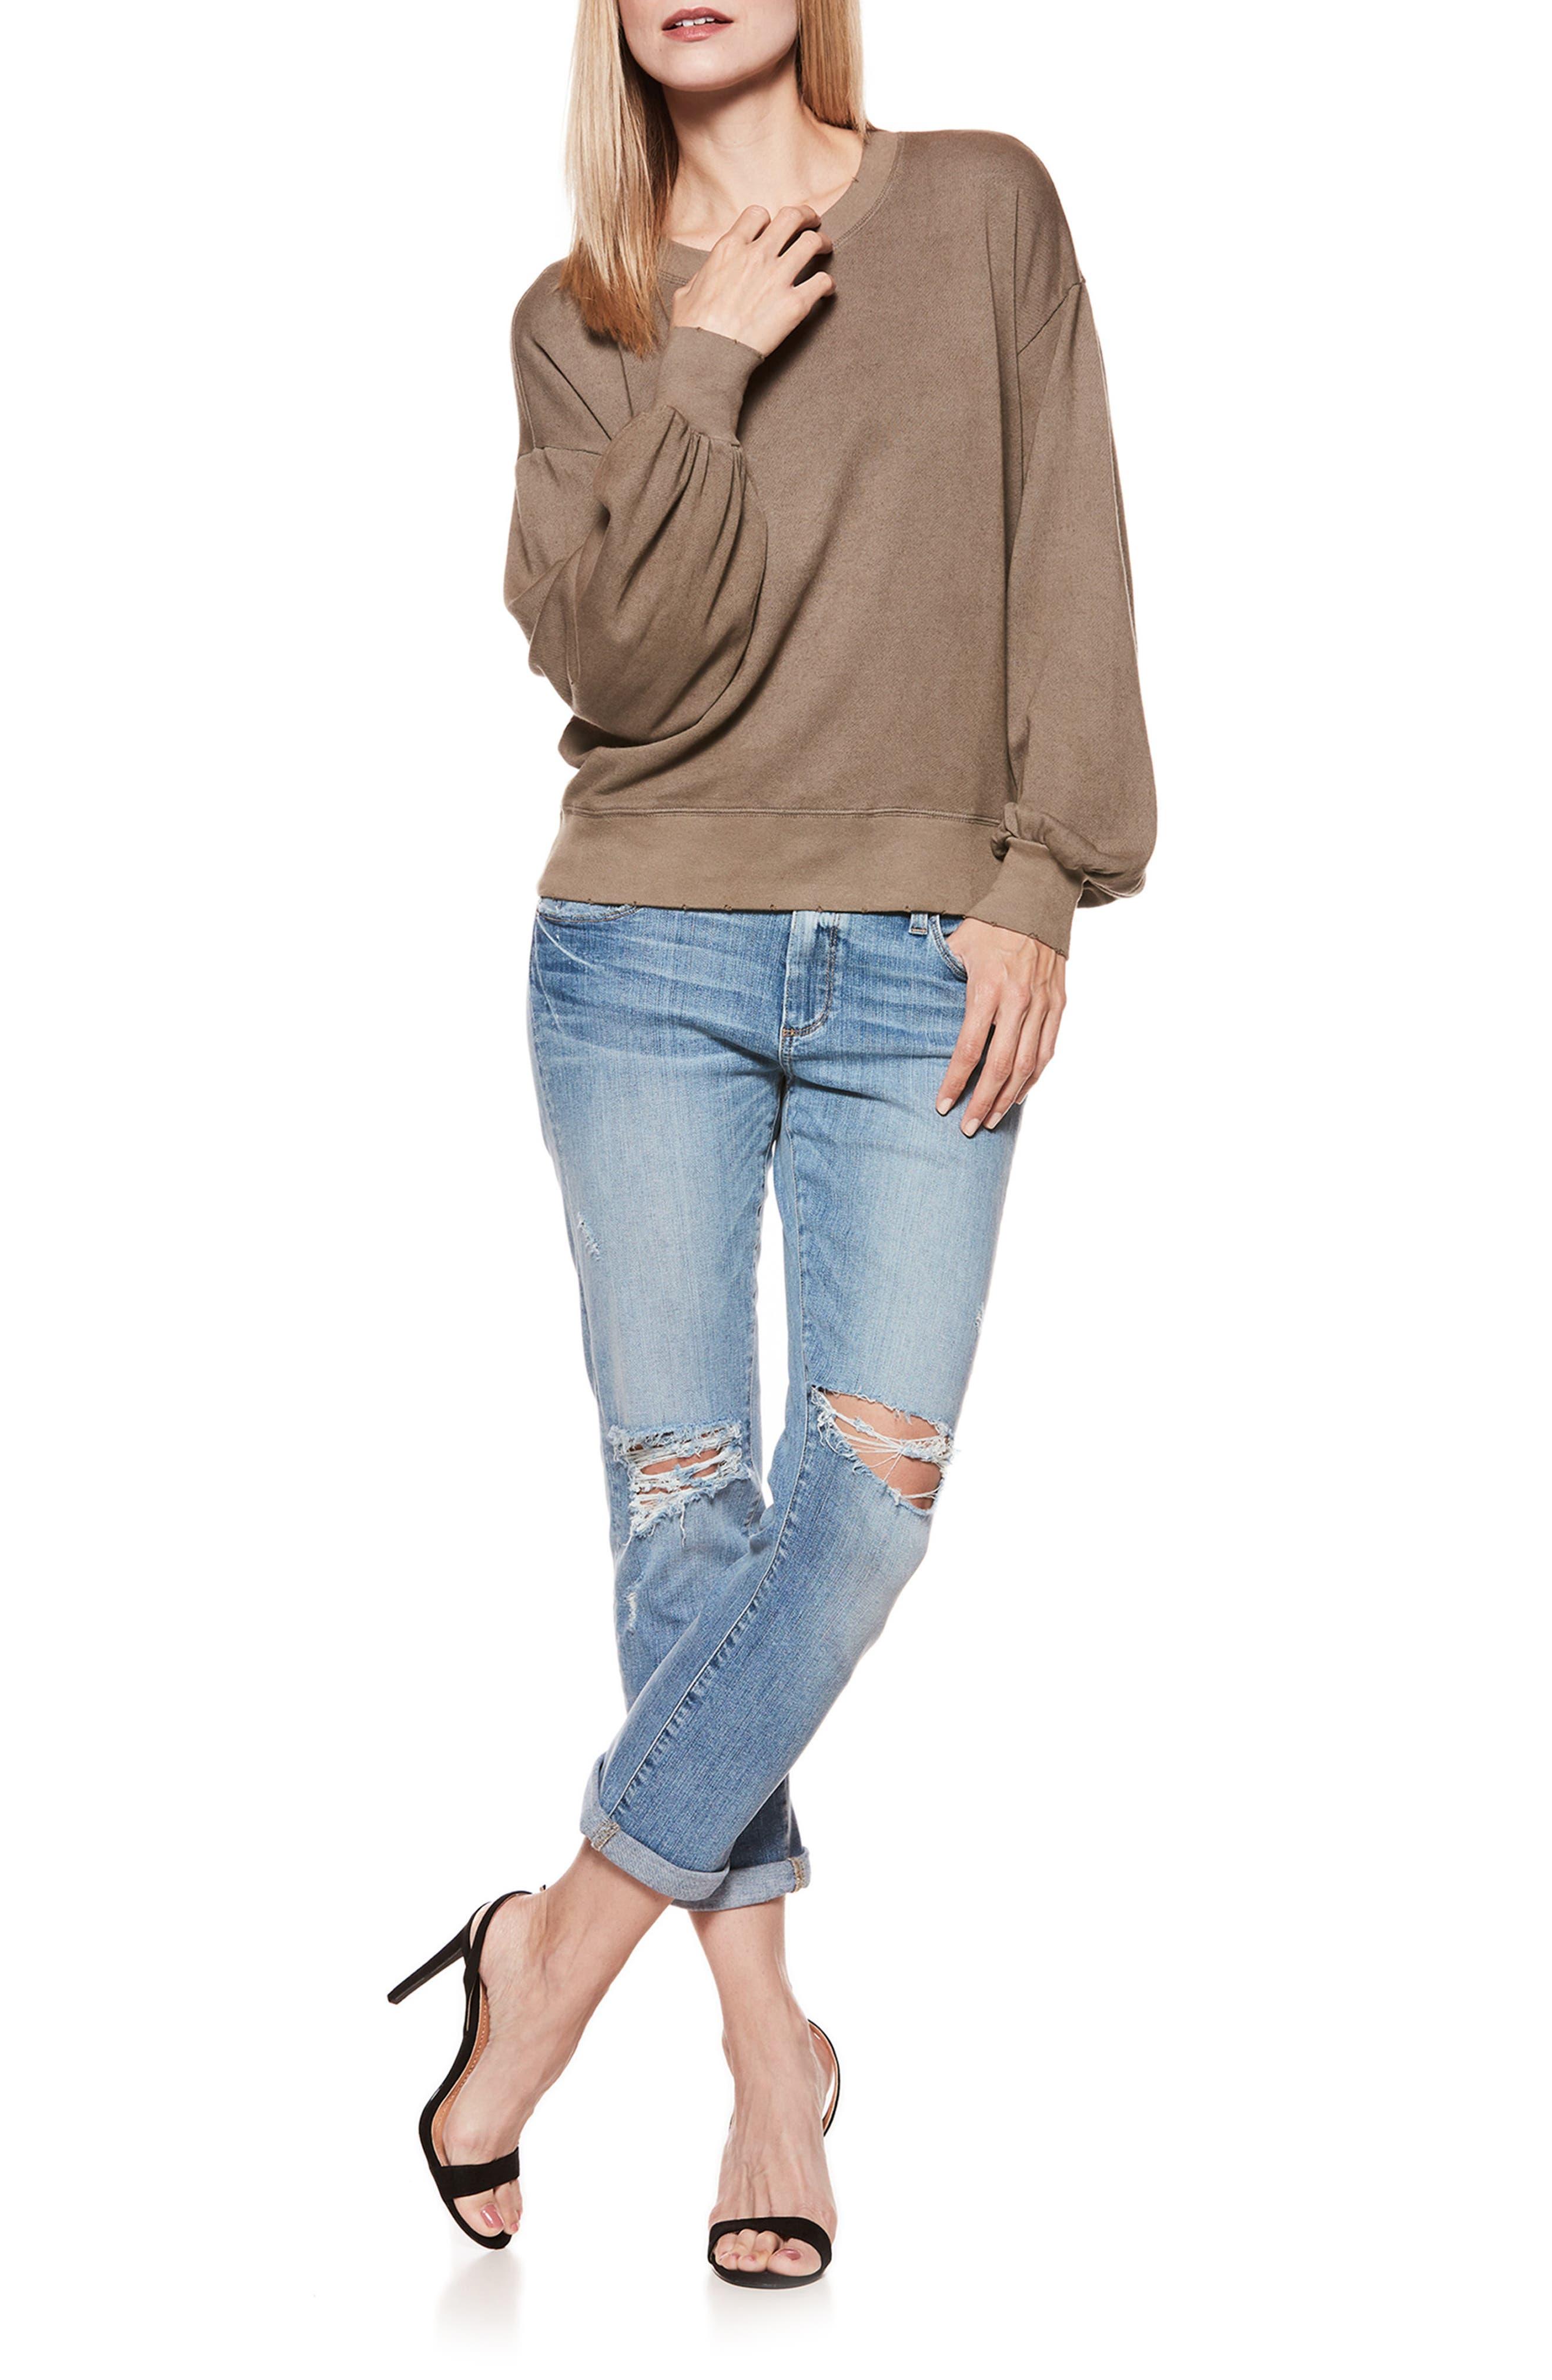 Cortlynn Sweatshirt,                             Alternate thumbnail 3, color,                             Tanned Olive